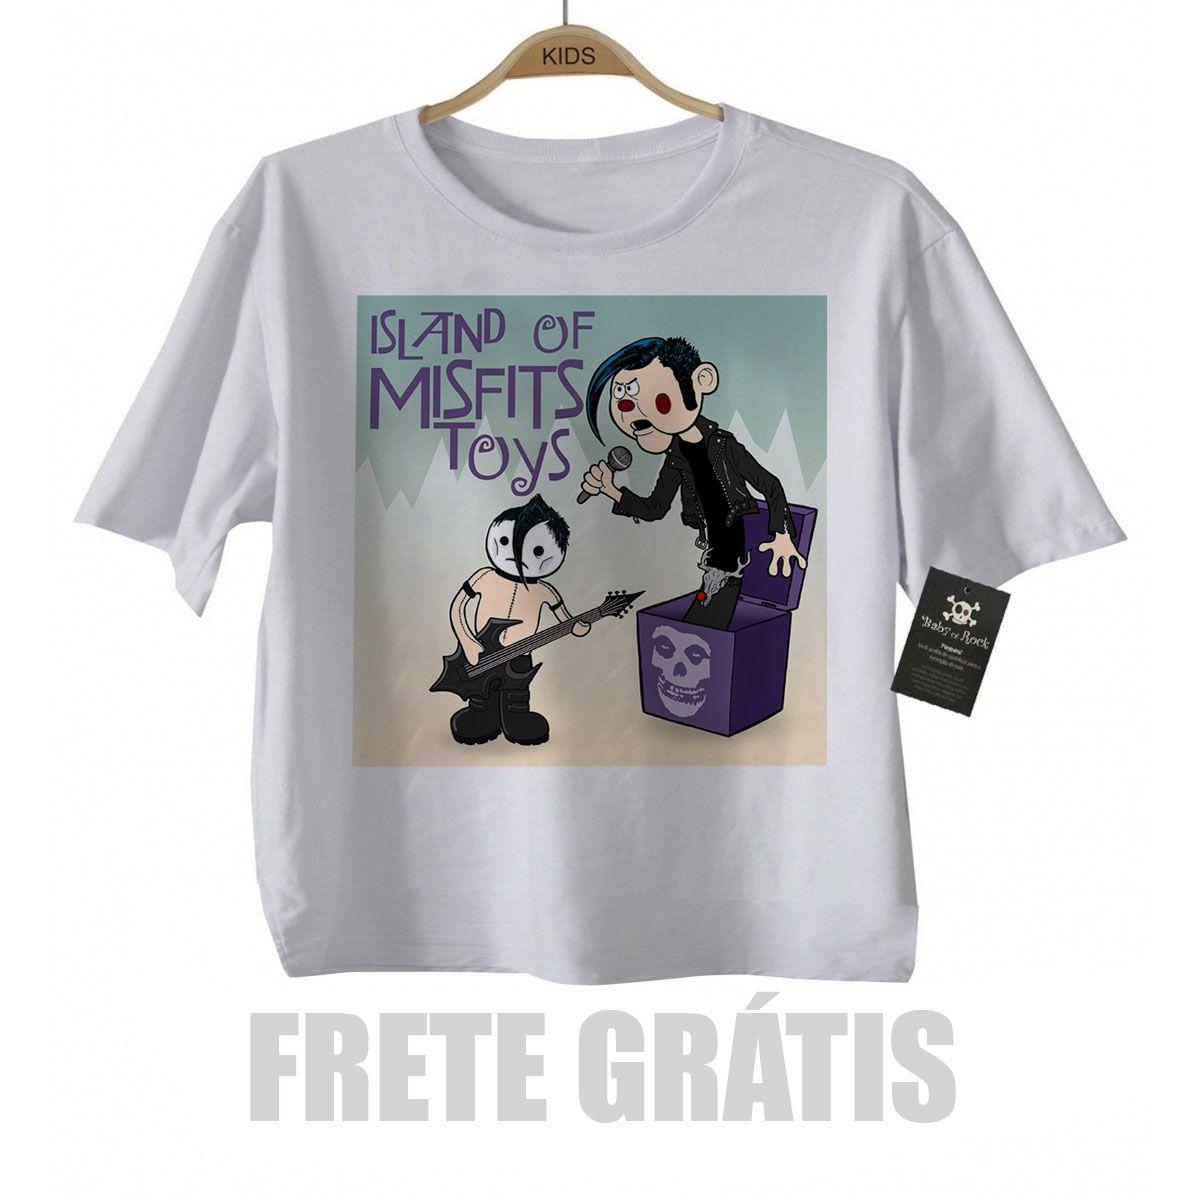 Camiseta Infantil Rock Misfits Toy - White -   - Baby Monster S/A